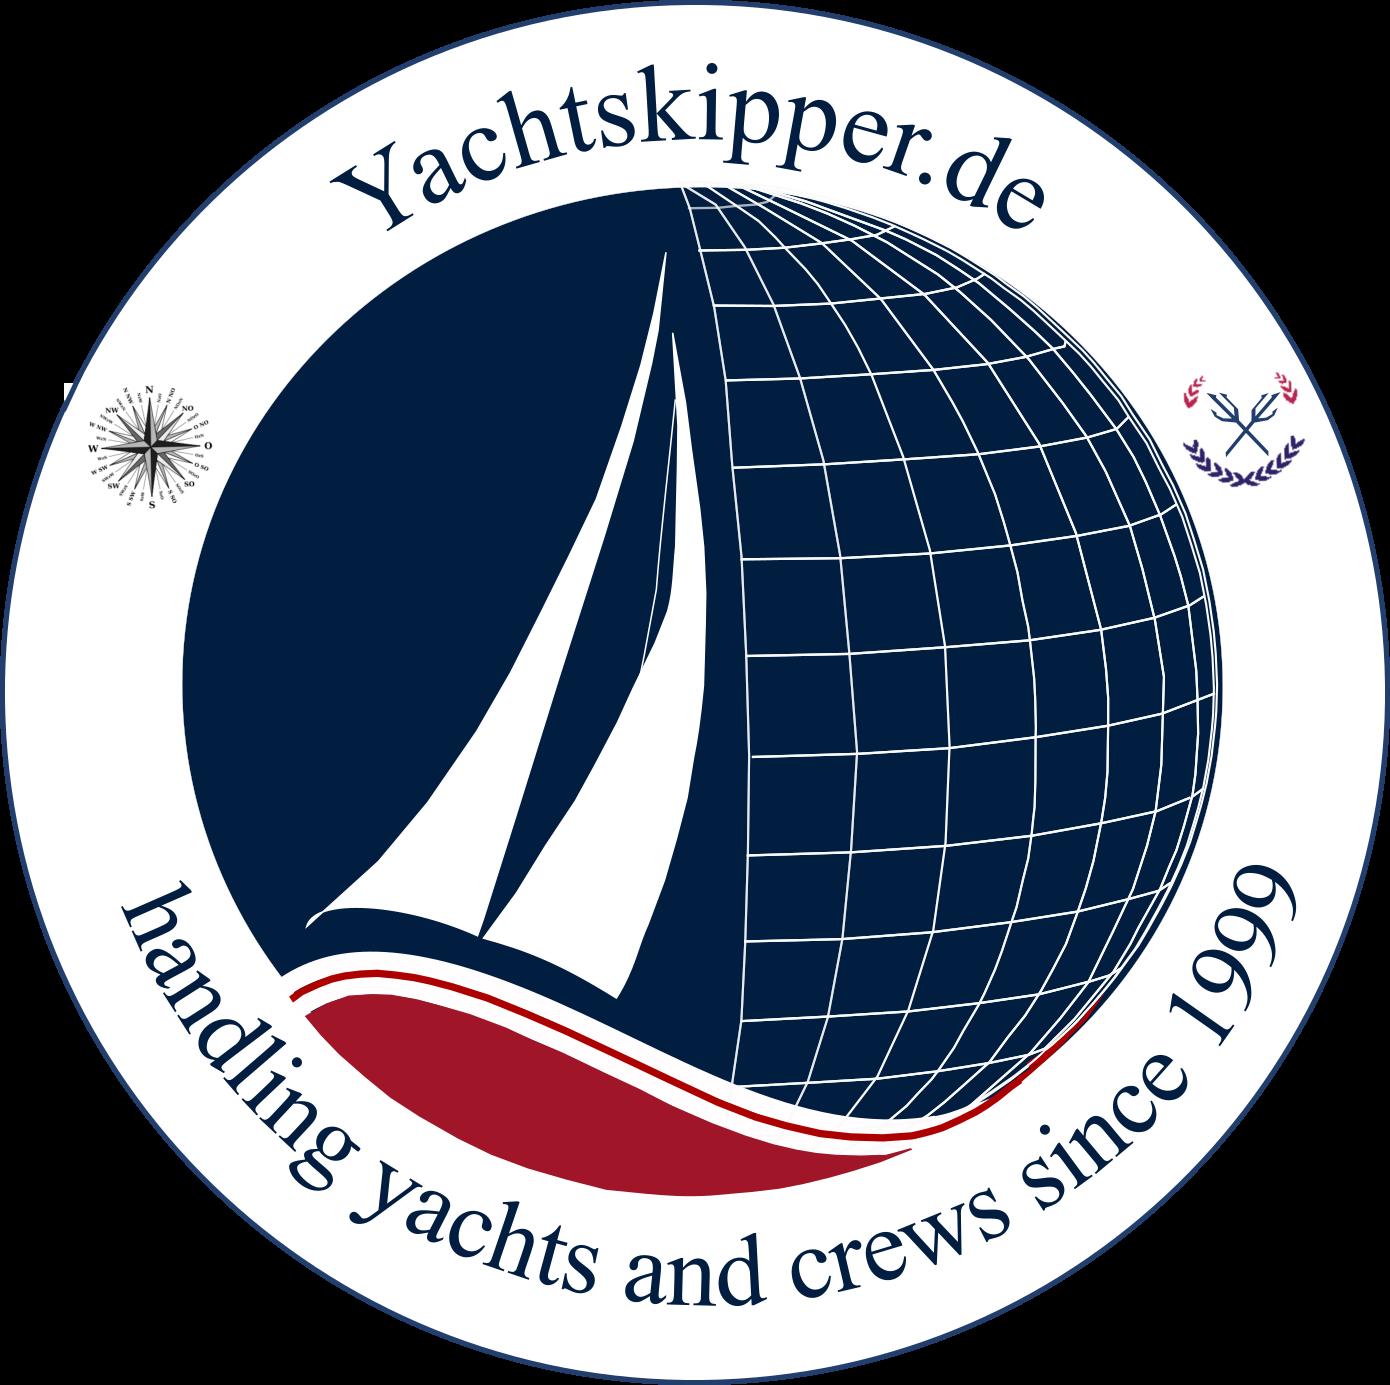 Yachtskipper.de